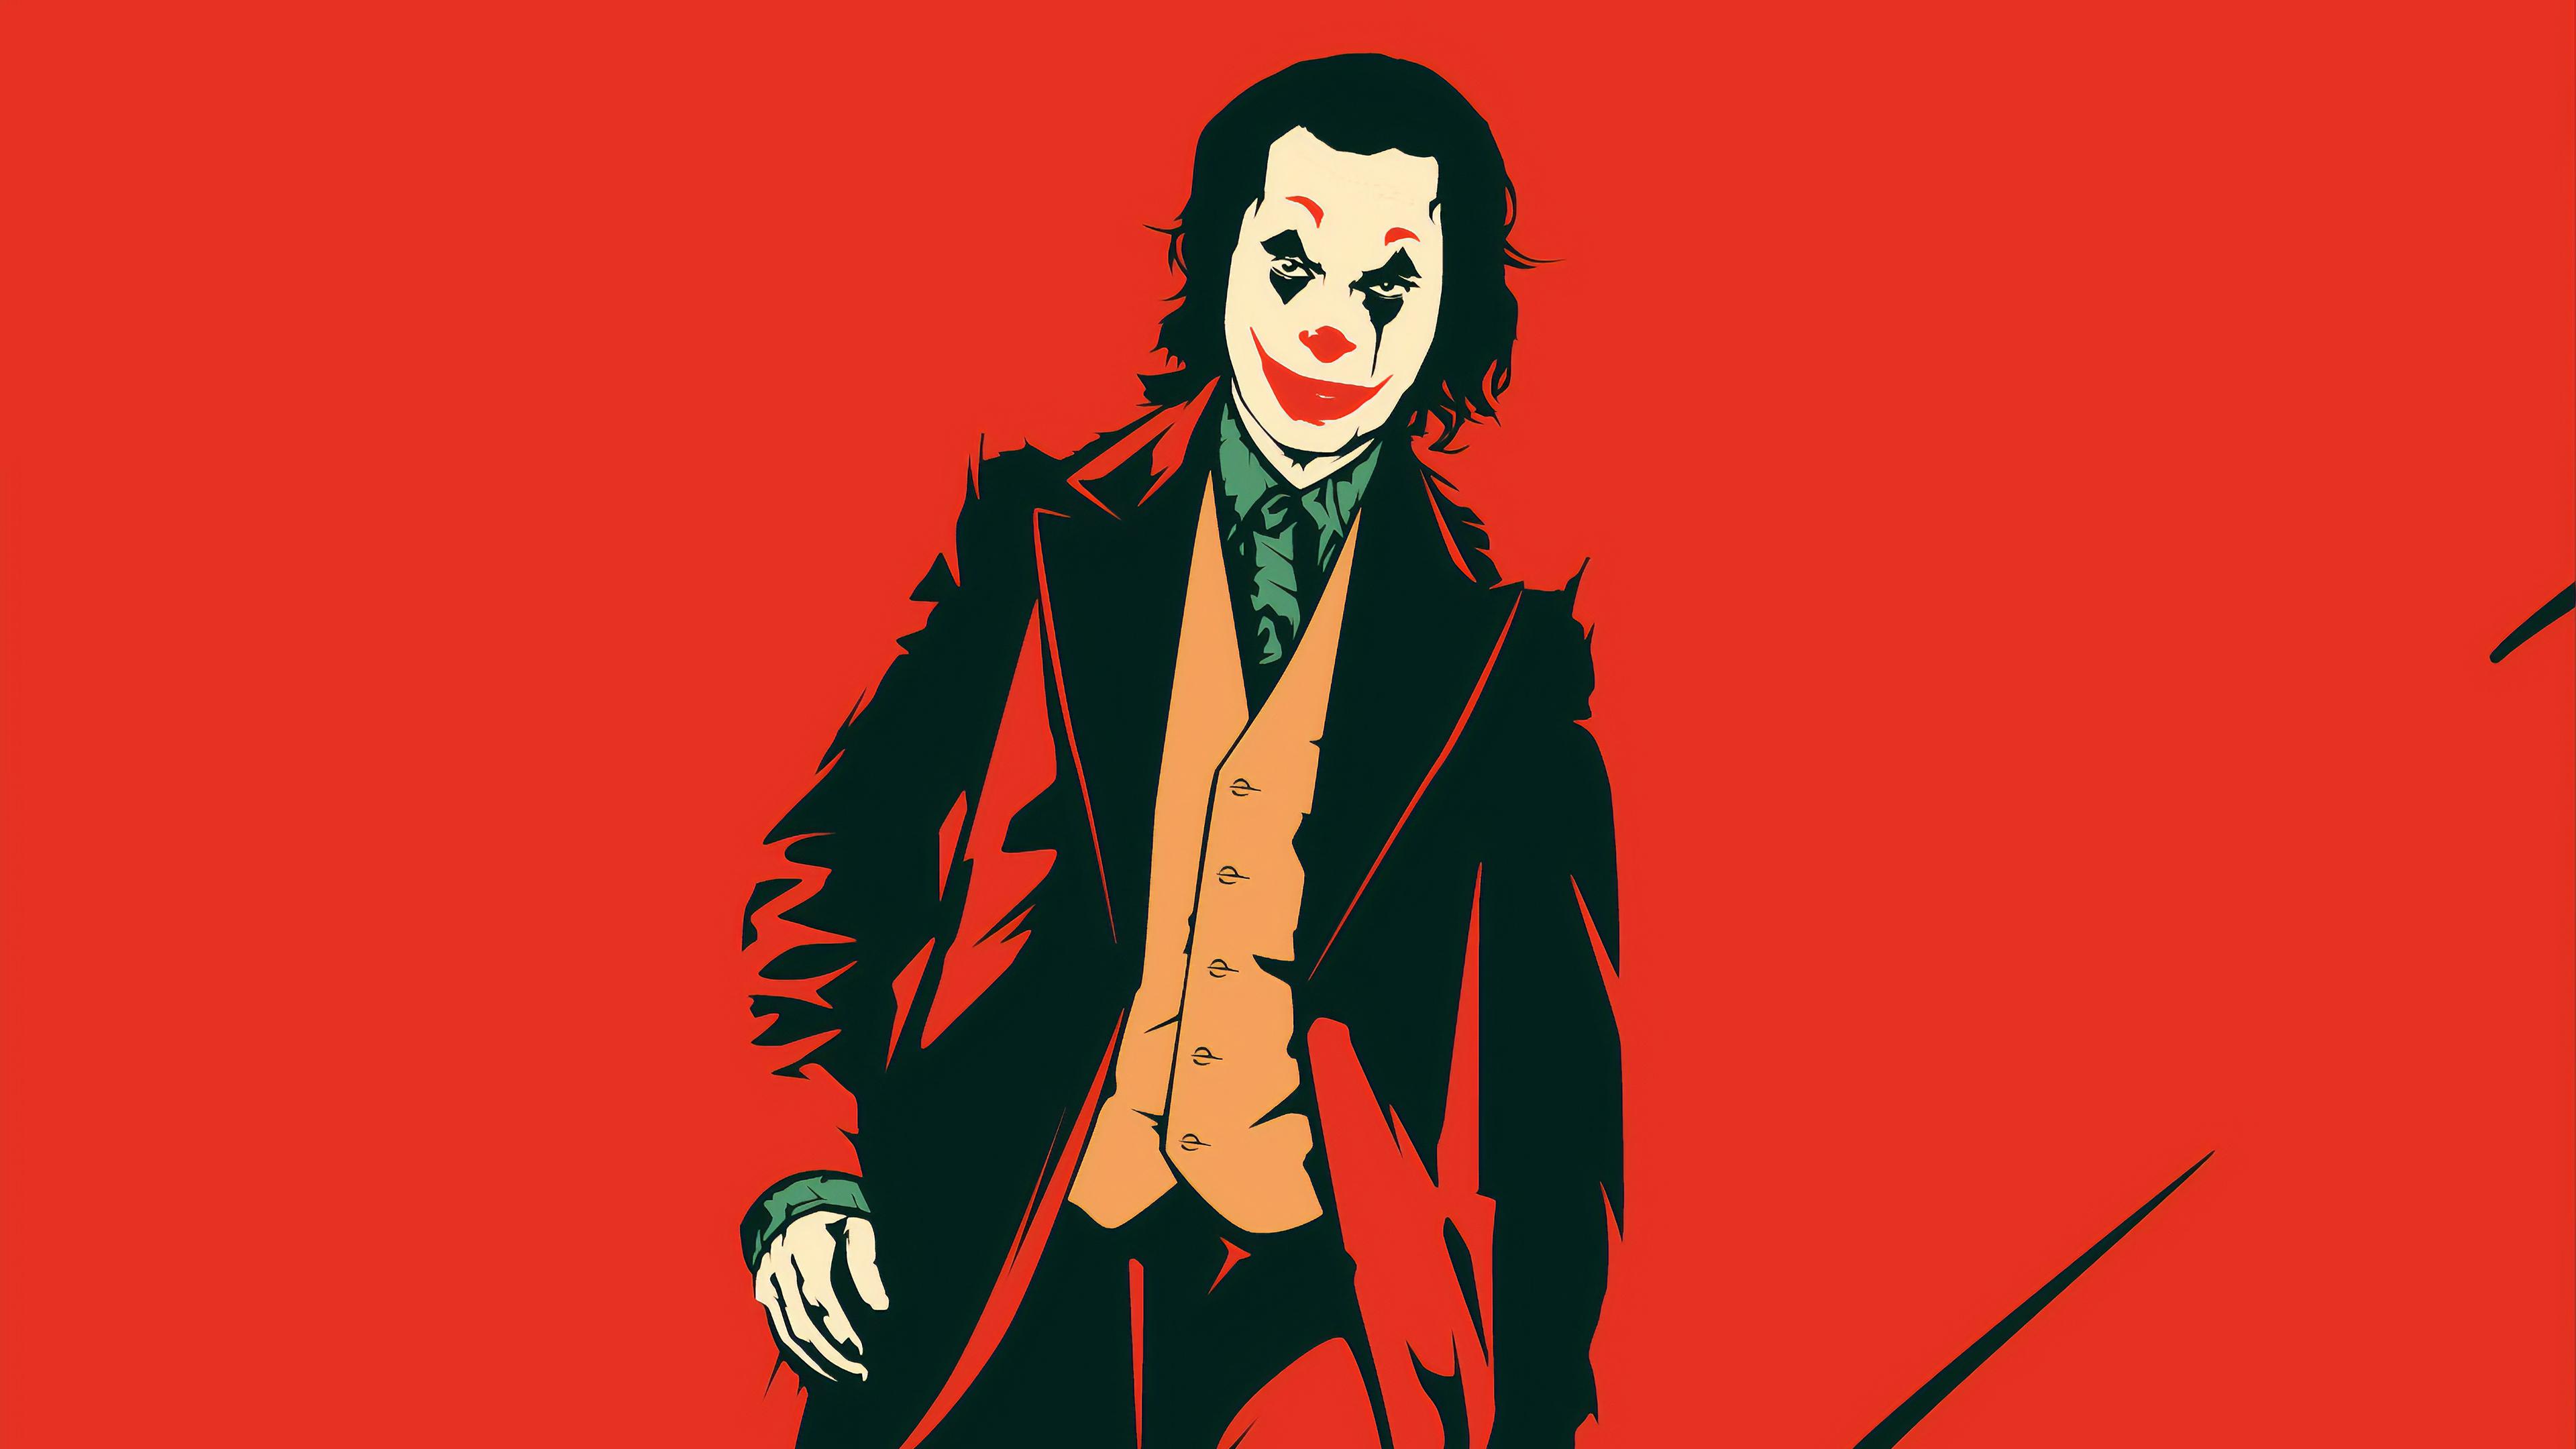 joker red 1570919686 - Joker Red - poster wallpapers, movies wallpapers, joker wallpapers, joker movie wallpapers, joaquin phoenix wallpapers, hd-wallpapers, behance wallpapers, 2019 movies wallpapers